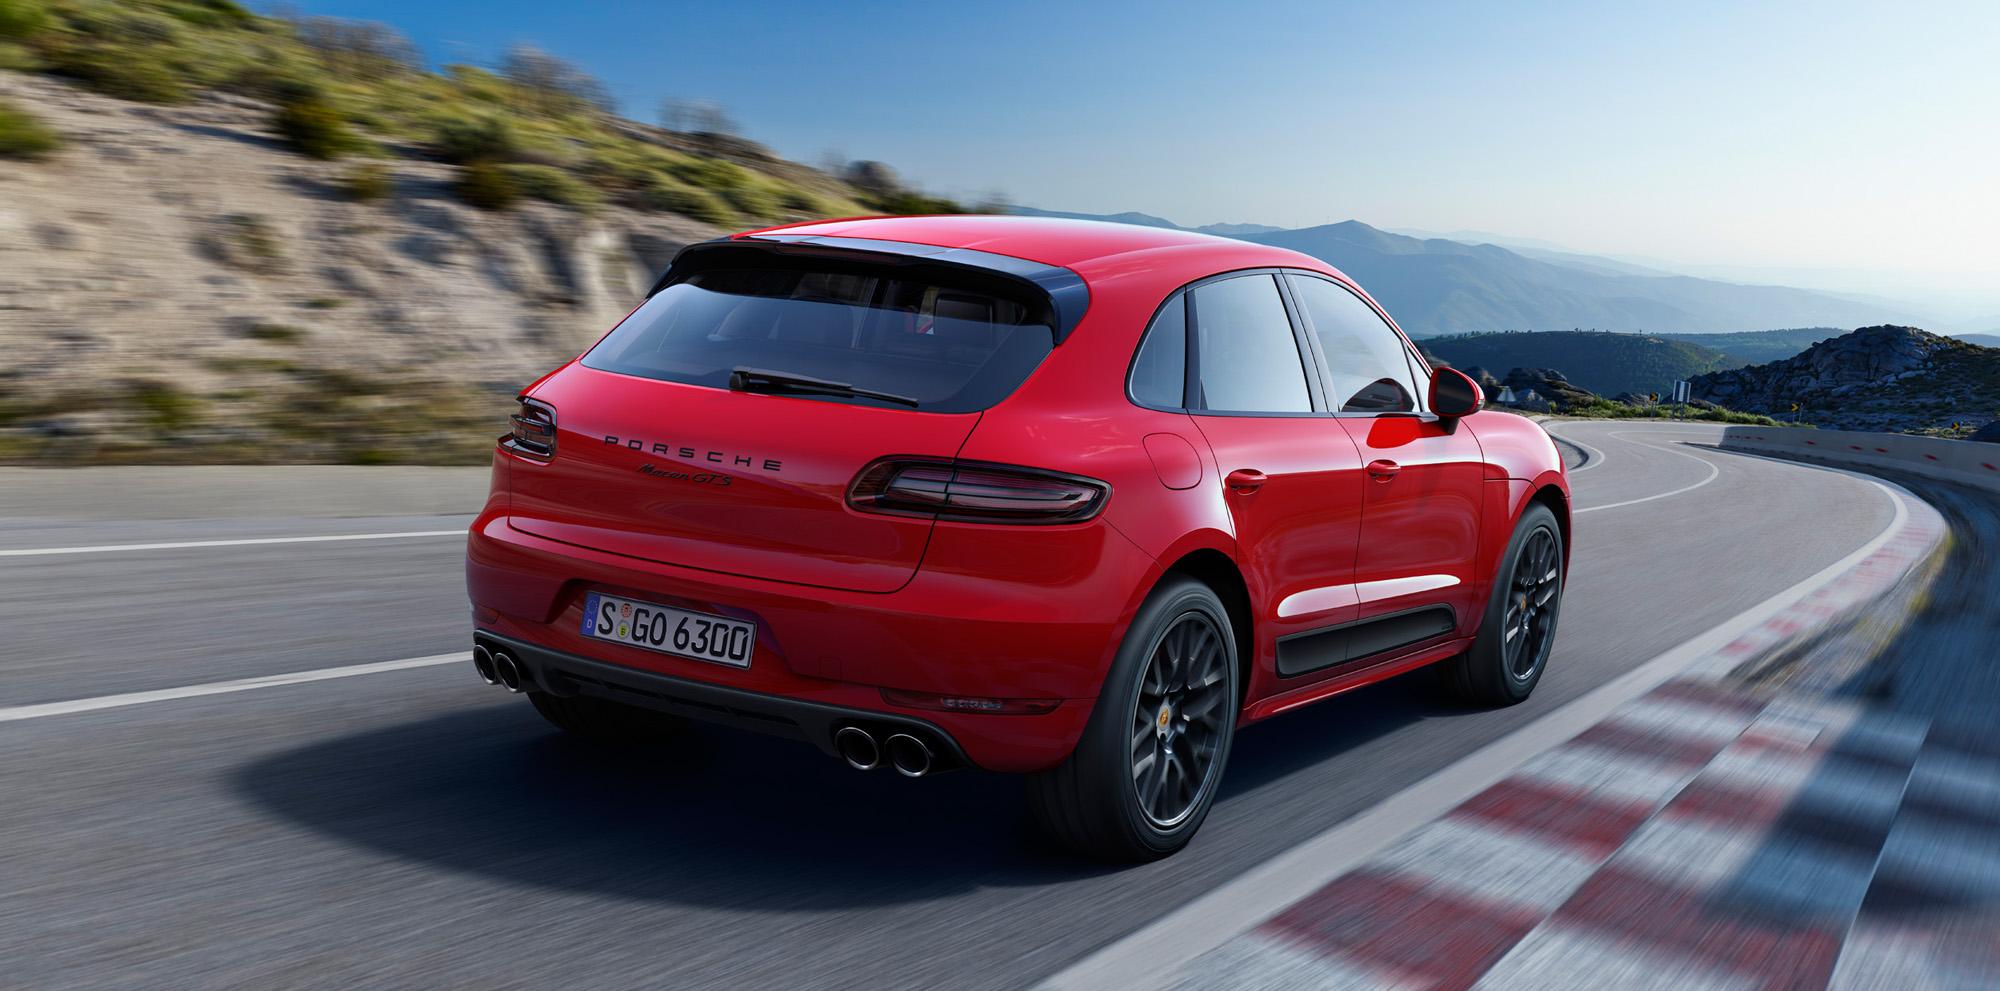 Porsche Macan Gts Trackday Tuning F 252 R Das Kompakt Suv